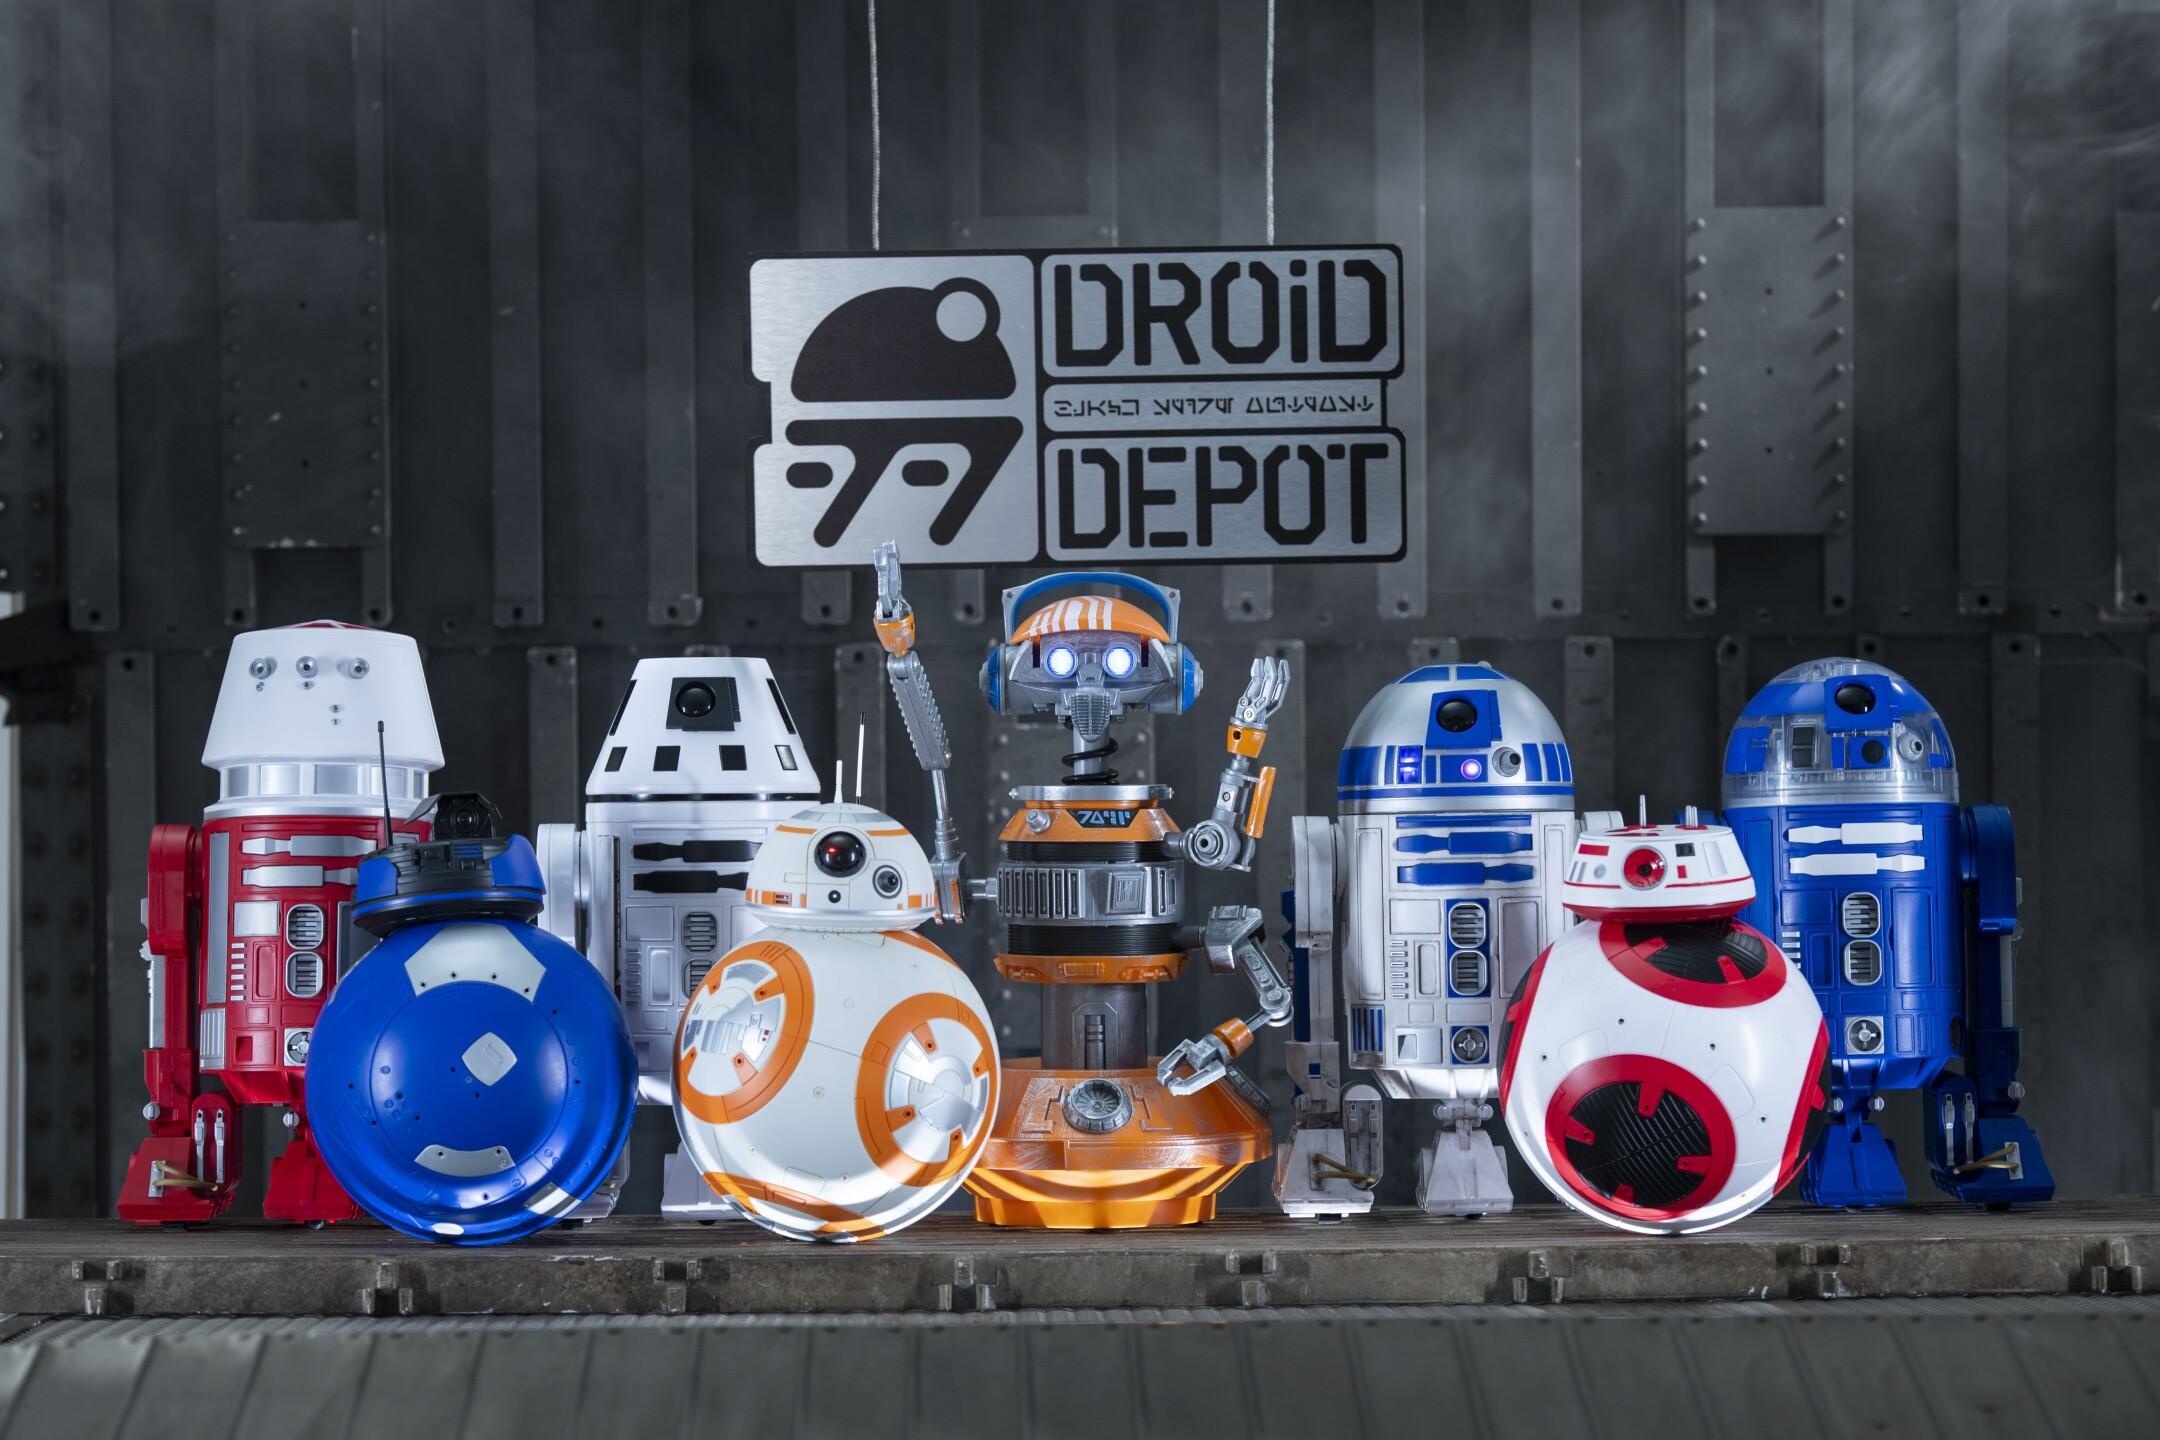 Star Wars: Galaxy's Edge Merchandise - Custom Droids